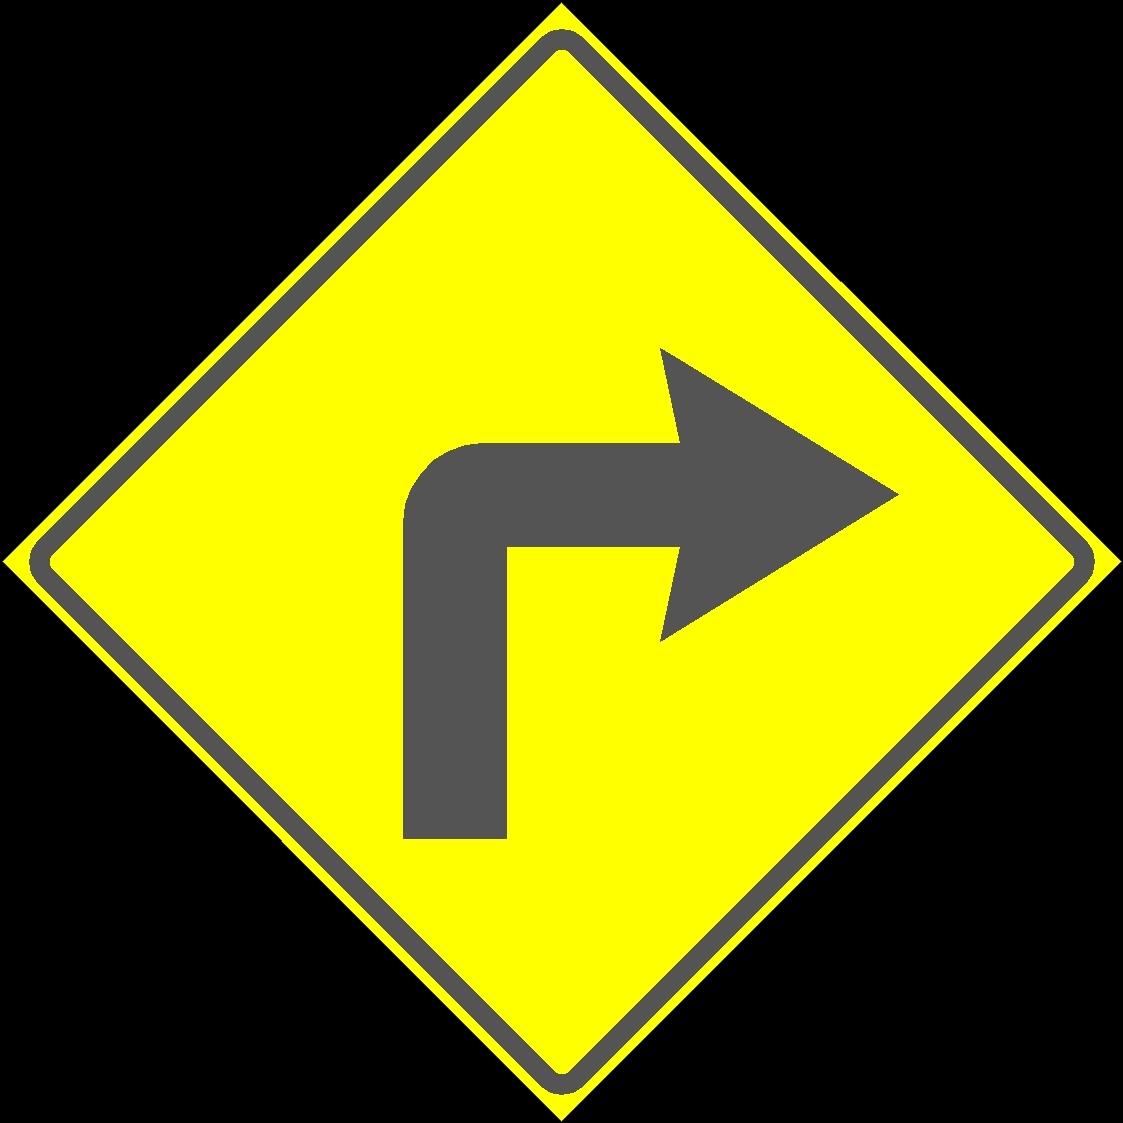 Road Signs And Symbols  Caution  Warning U2013brazil Dwg Block